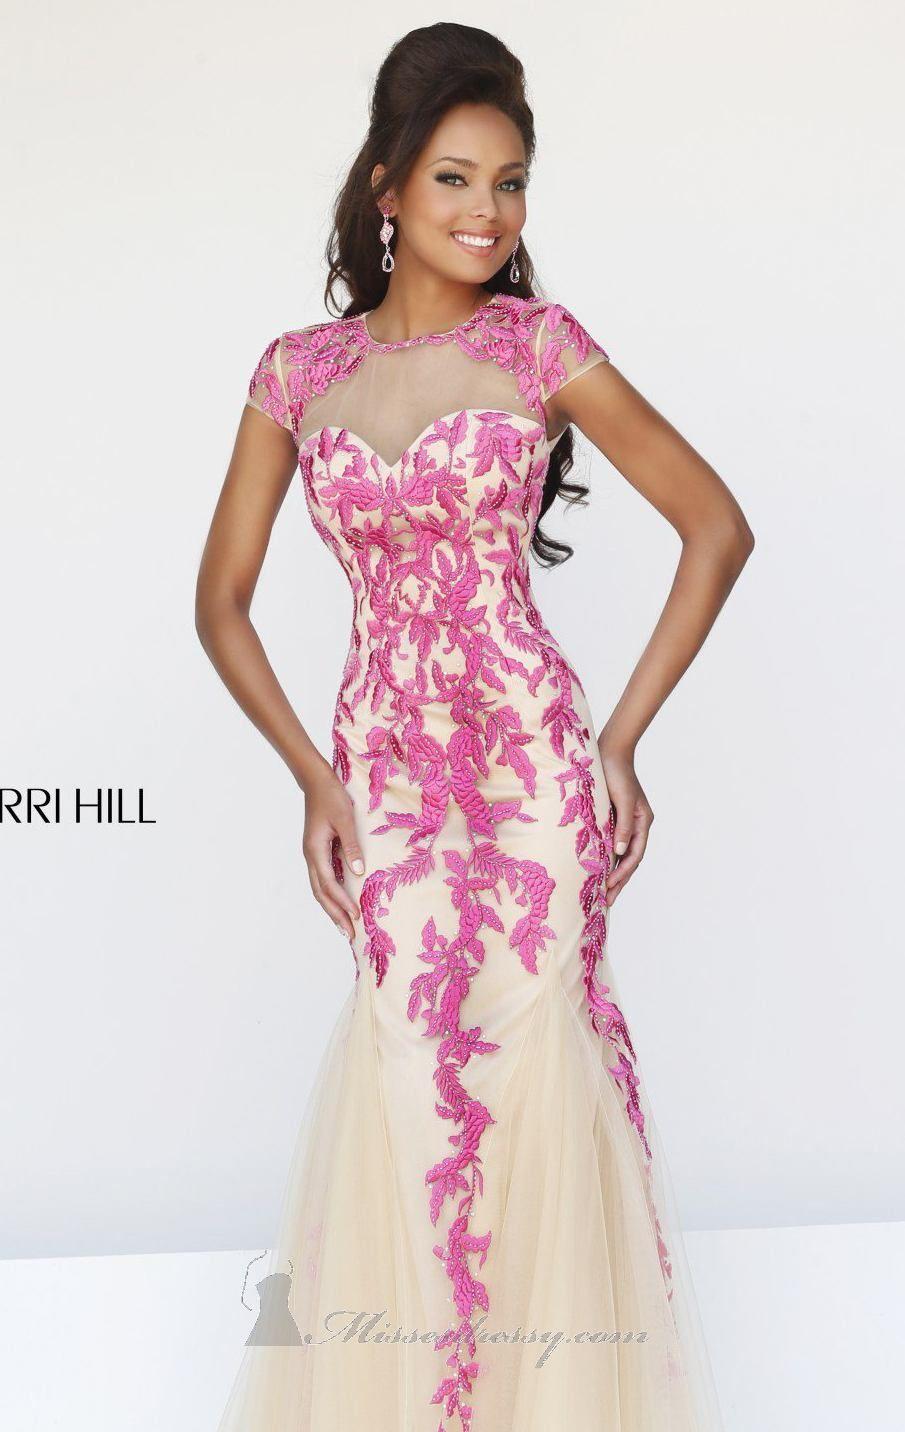 Sherri Hill 1927 Dress - MissesDressy.com | Evening Gowns | Pinterest